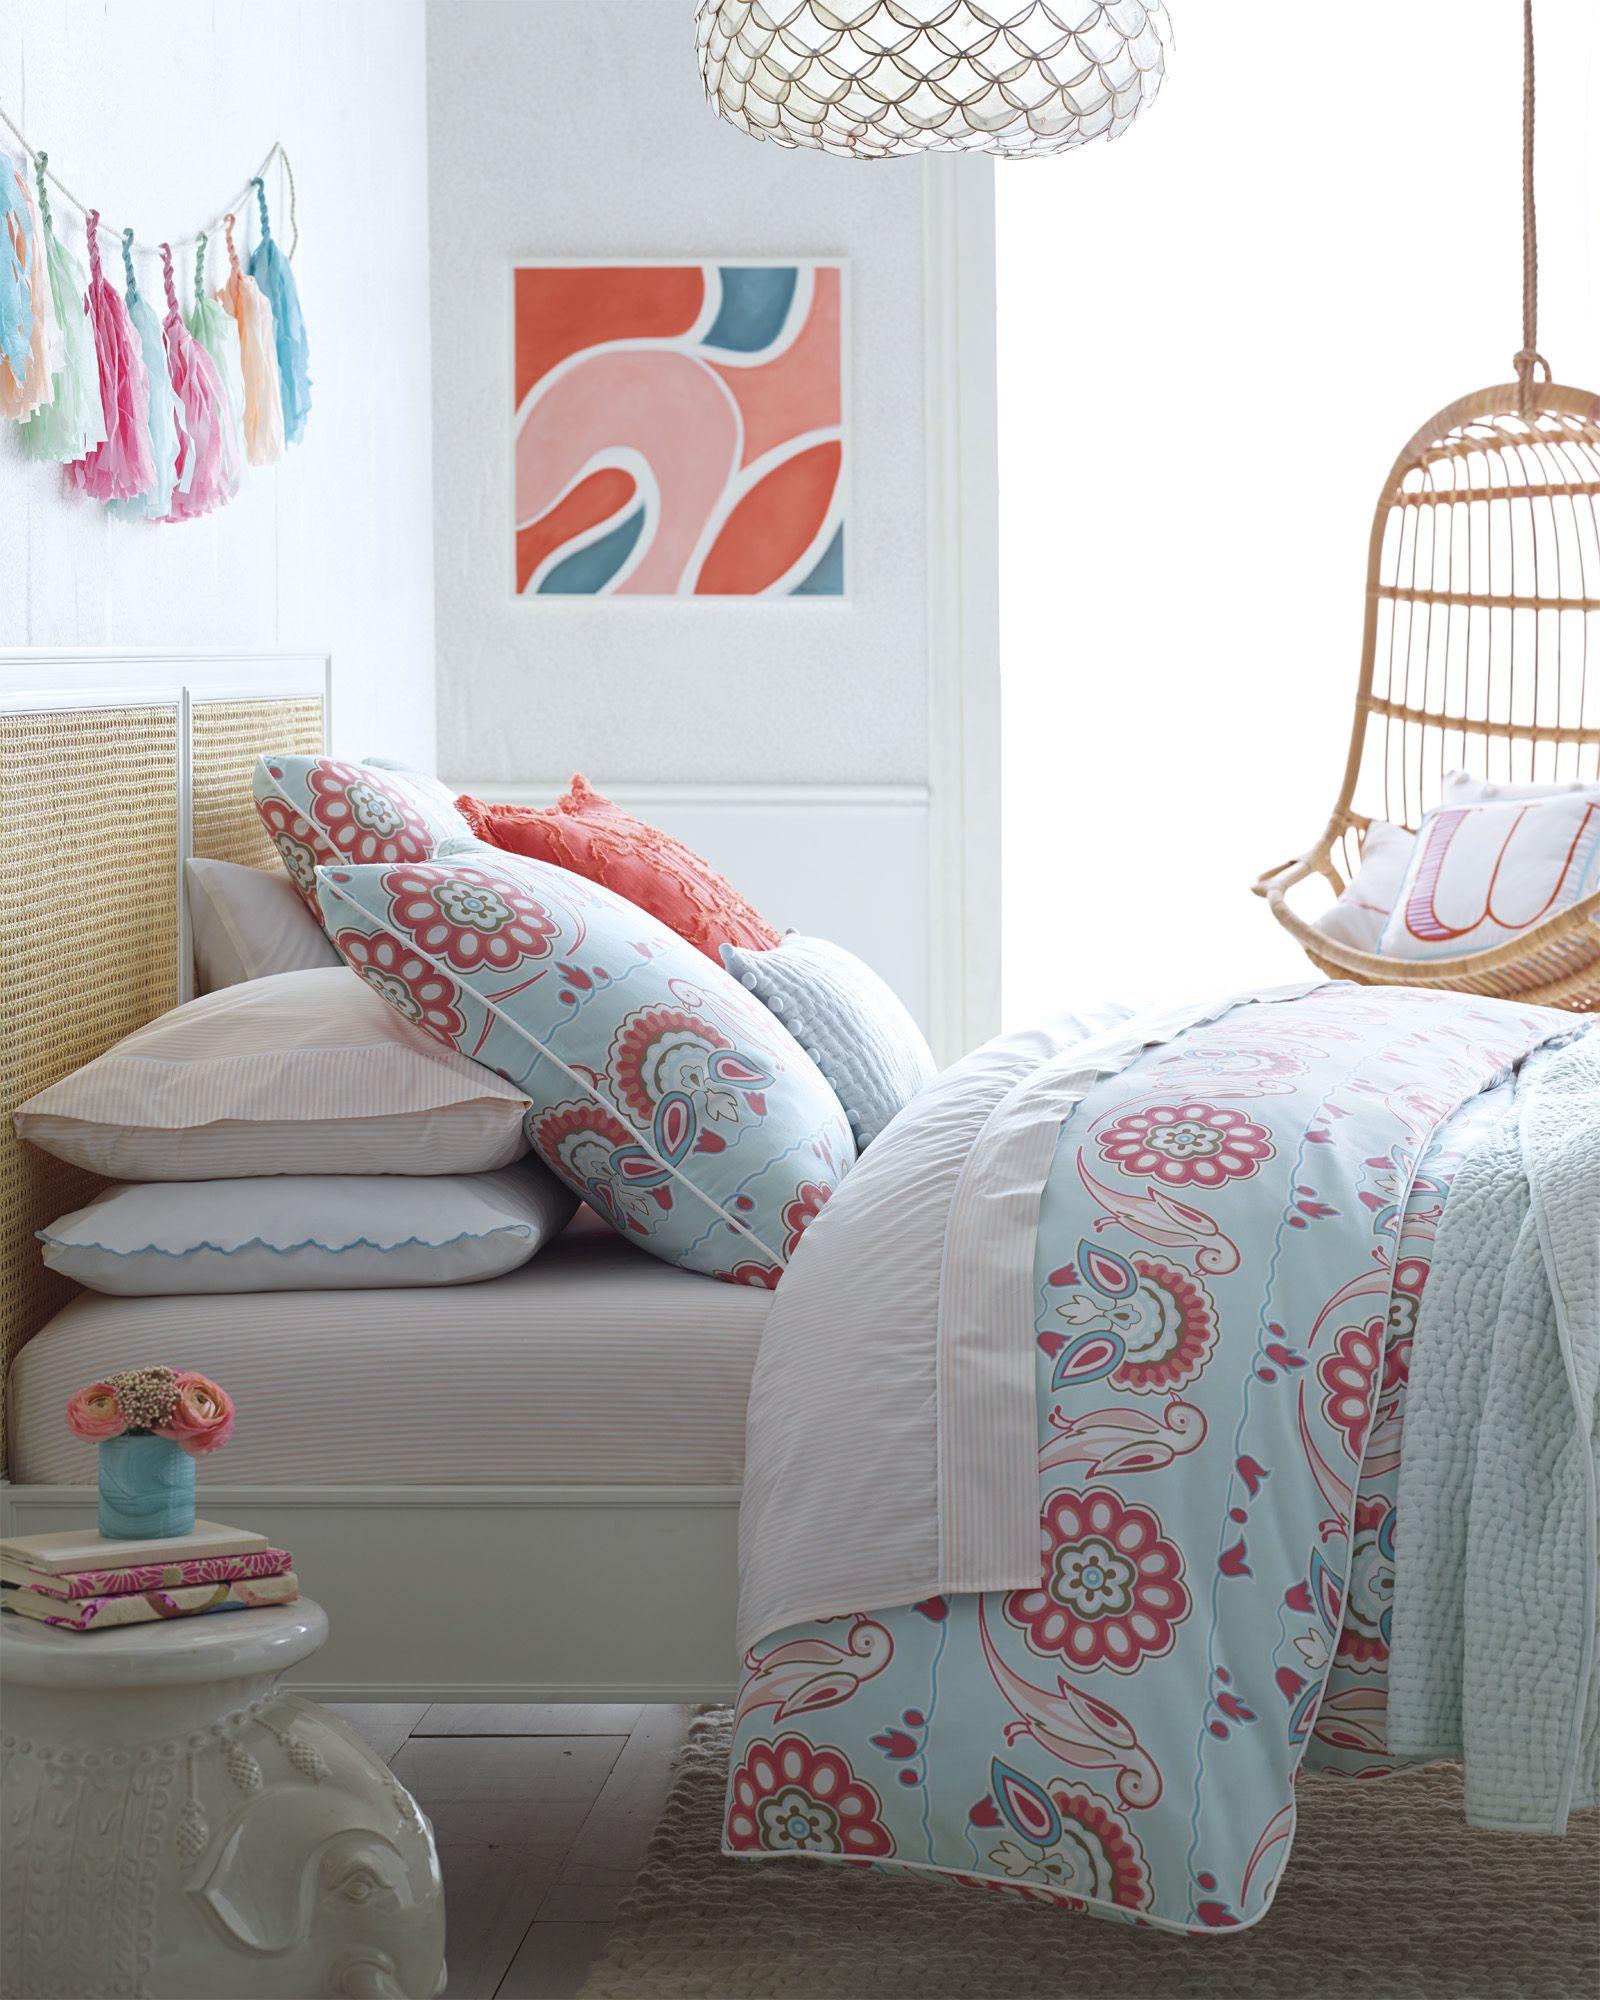 Bedroom ideas for your little girl | Annabel Duvet Cover via Serena & Lily